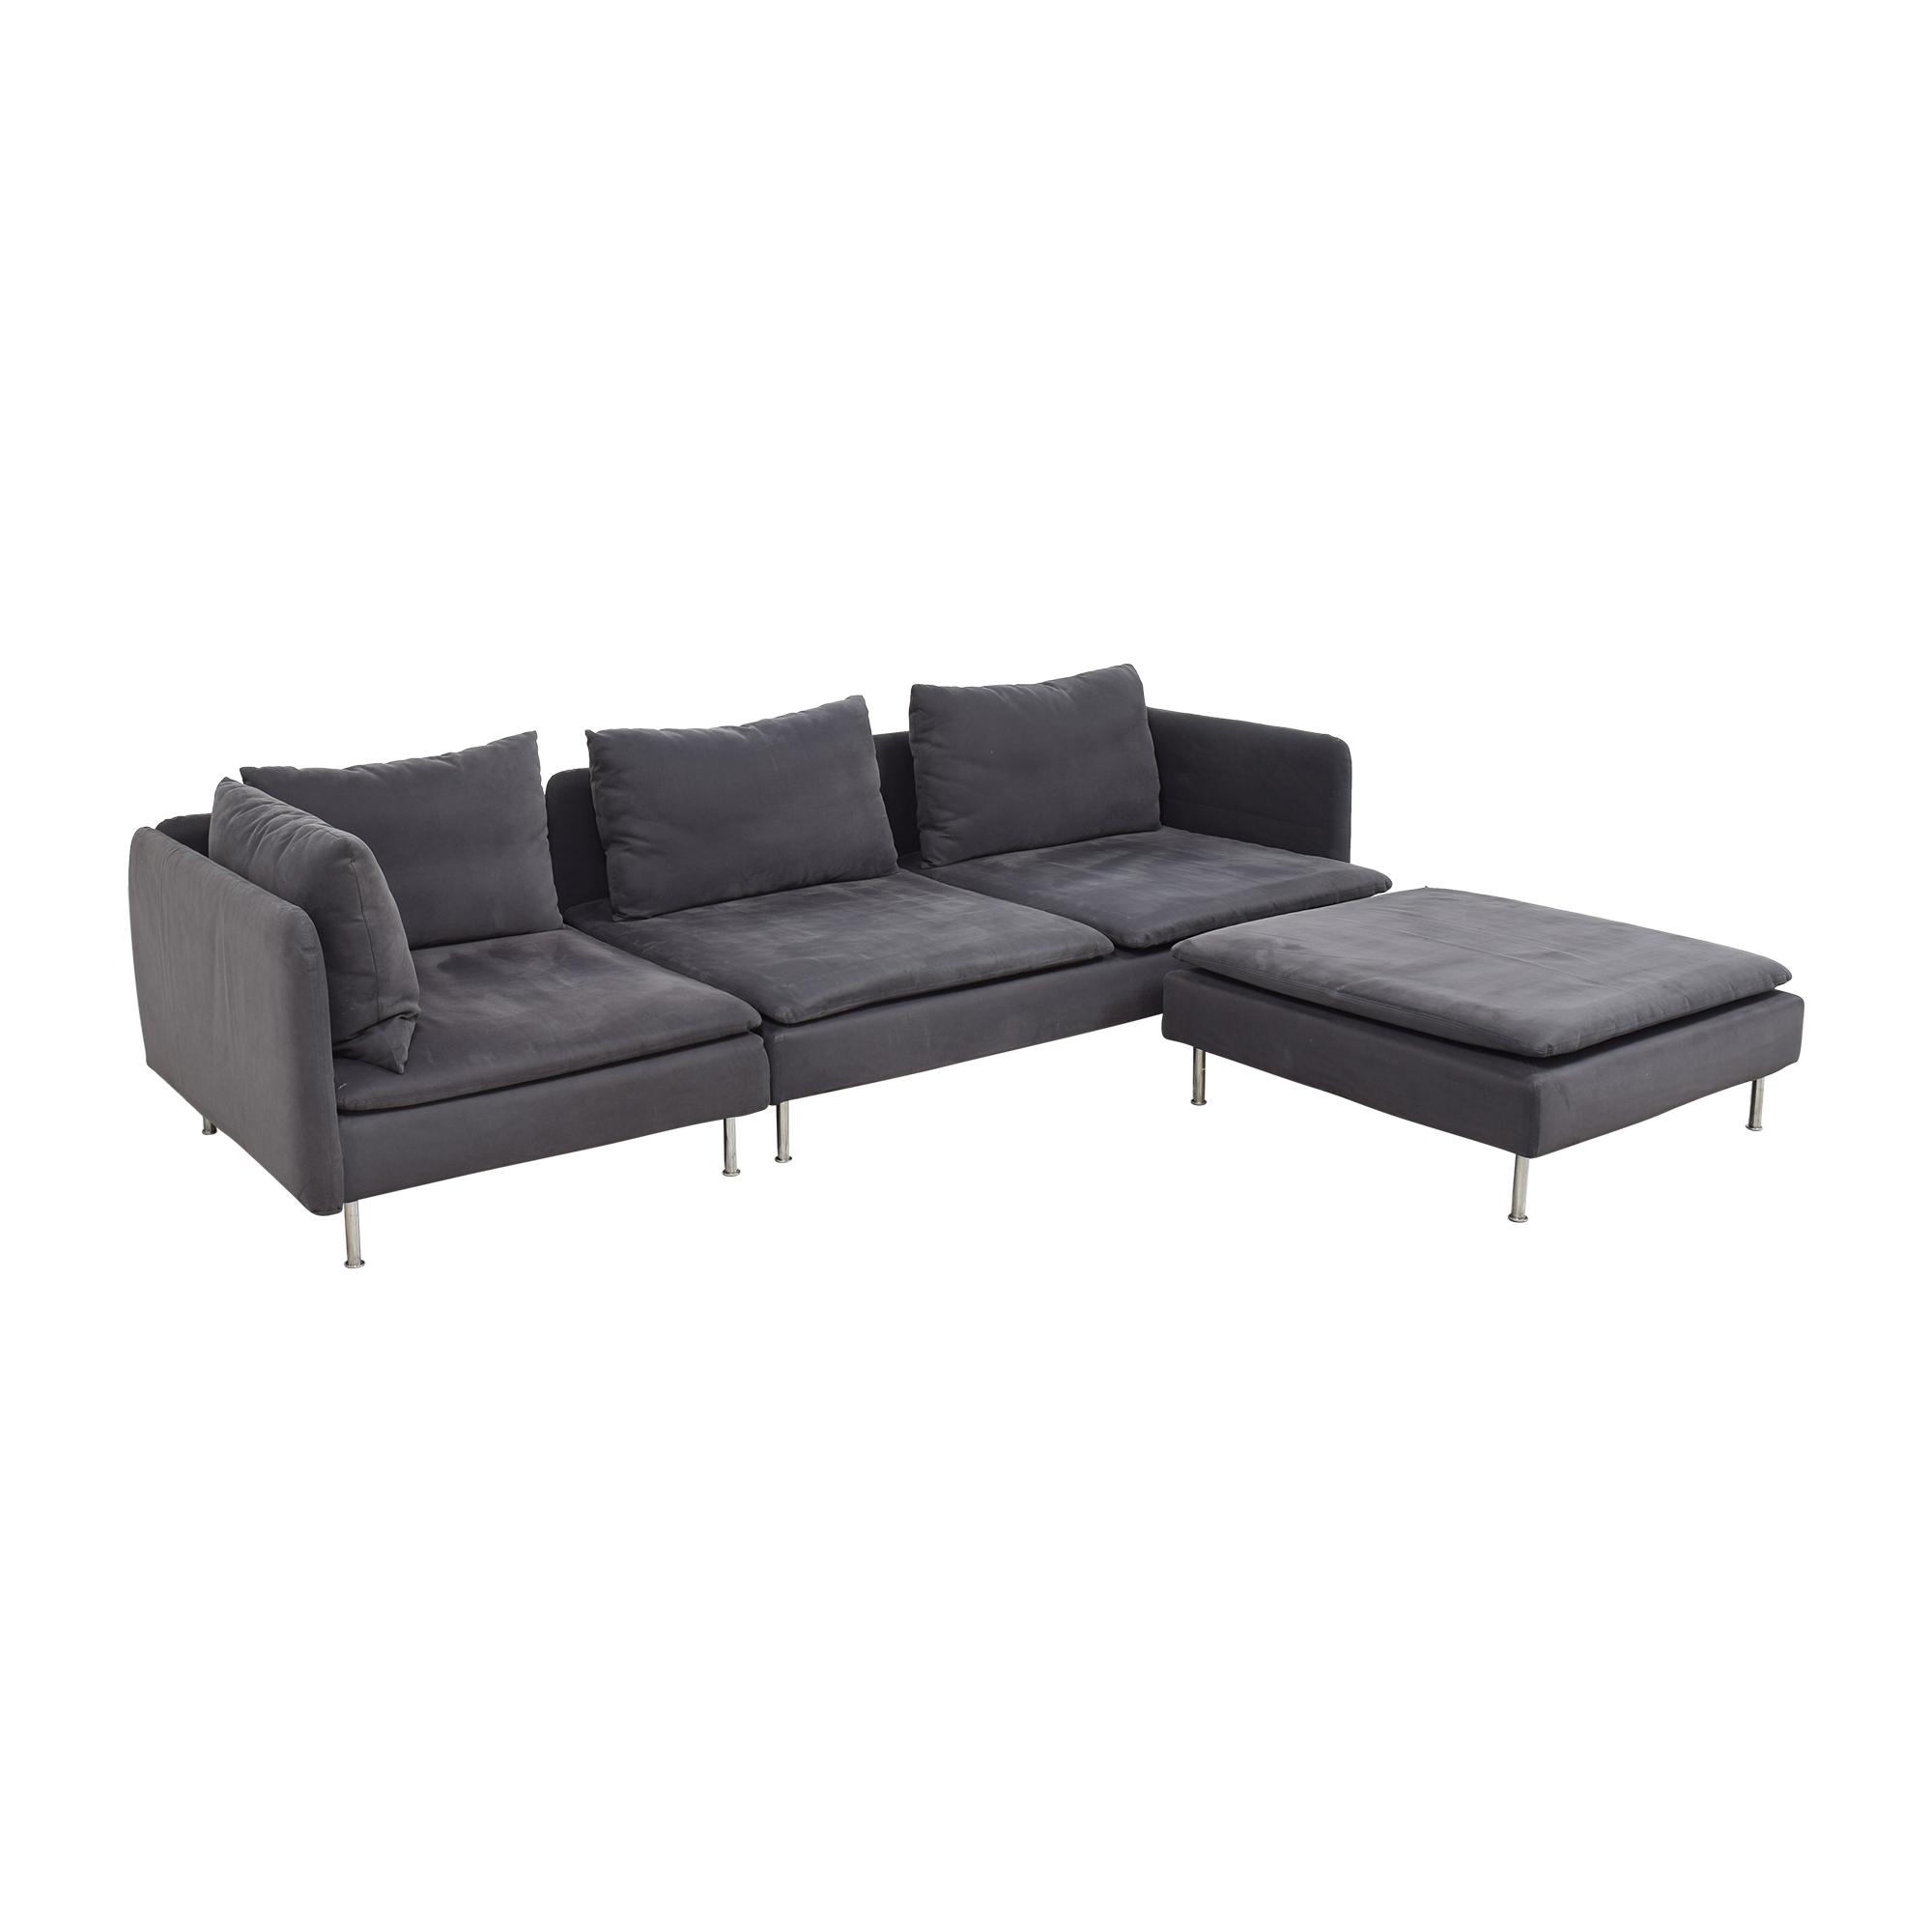 IKEA IKEA SÖDERHAMN Sectional Sofa with Ottoman dimensions